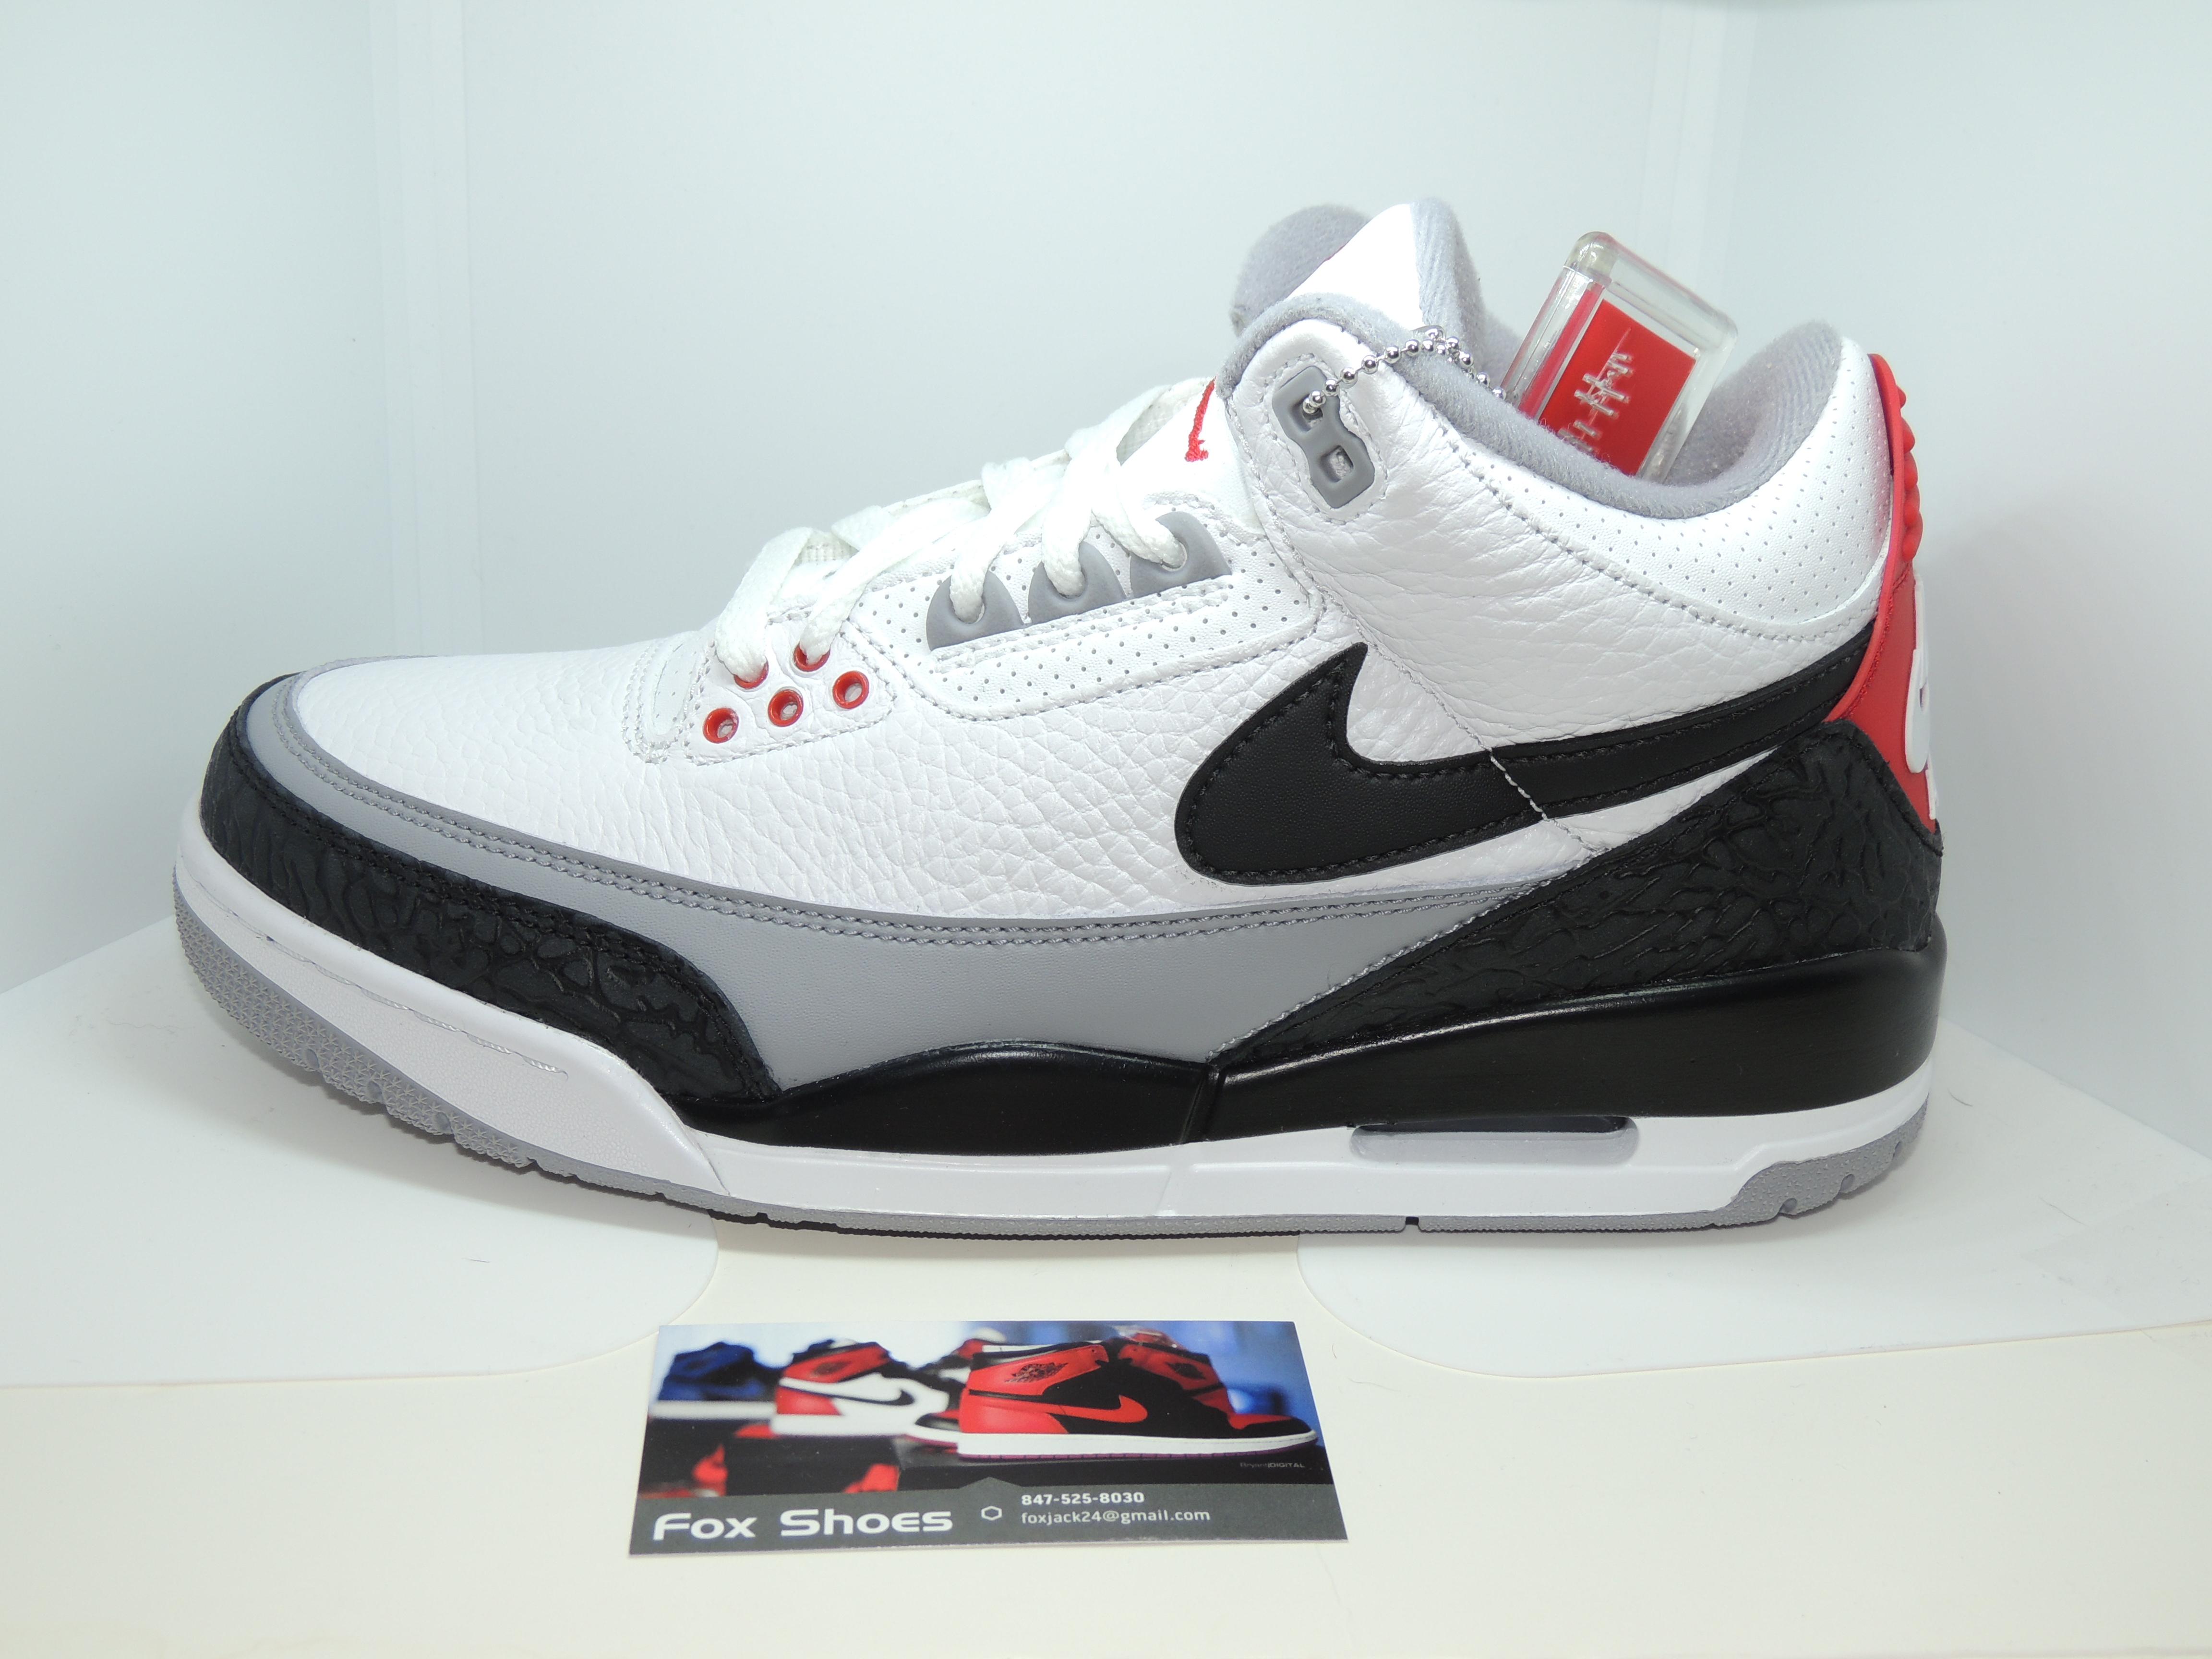 428f4163848b Jordan Brand ×. Nike Air Jordan Retro 3 NRG SZ 8.5 Tinker Hatfield White  Cement OG AQ3835-160